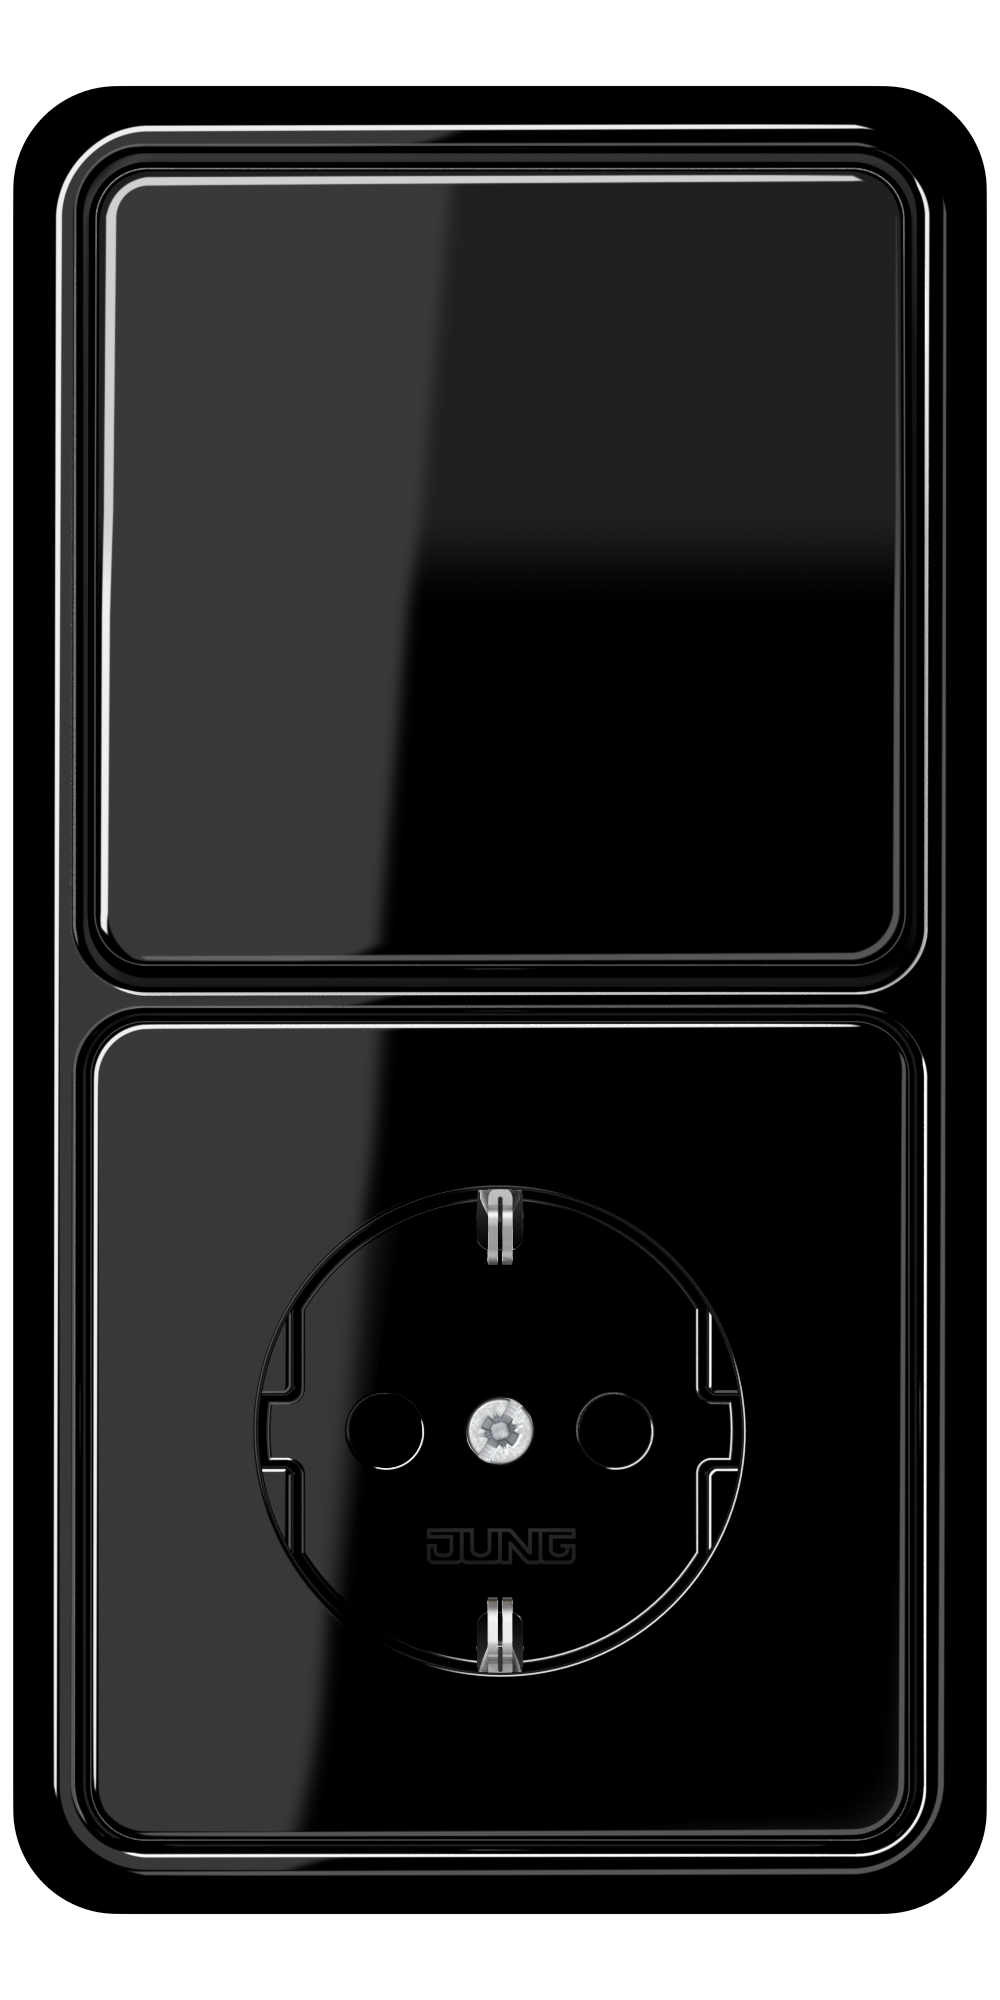 JUNG_CD500_black_switch-socket